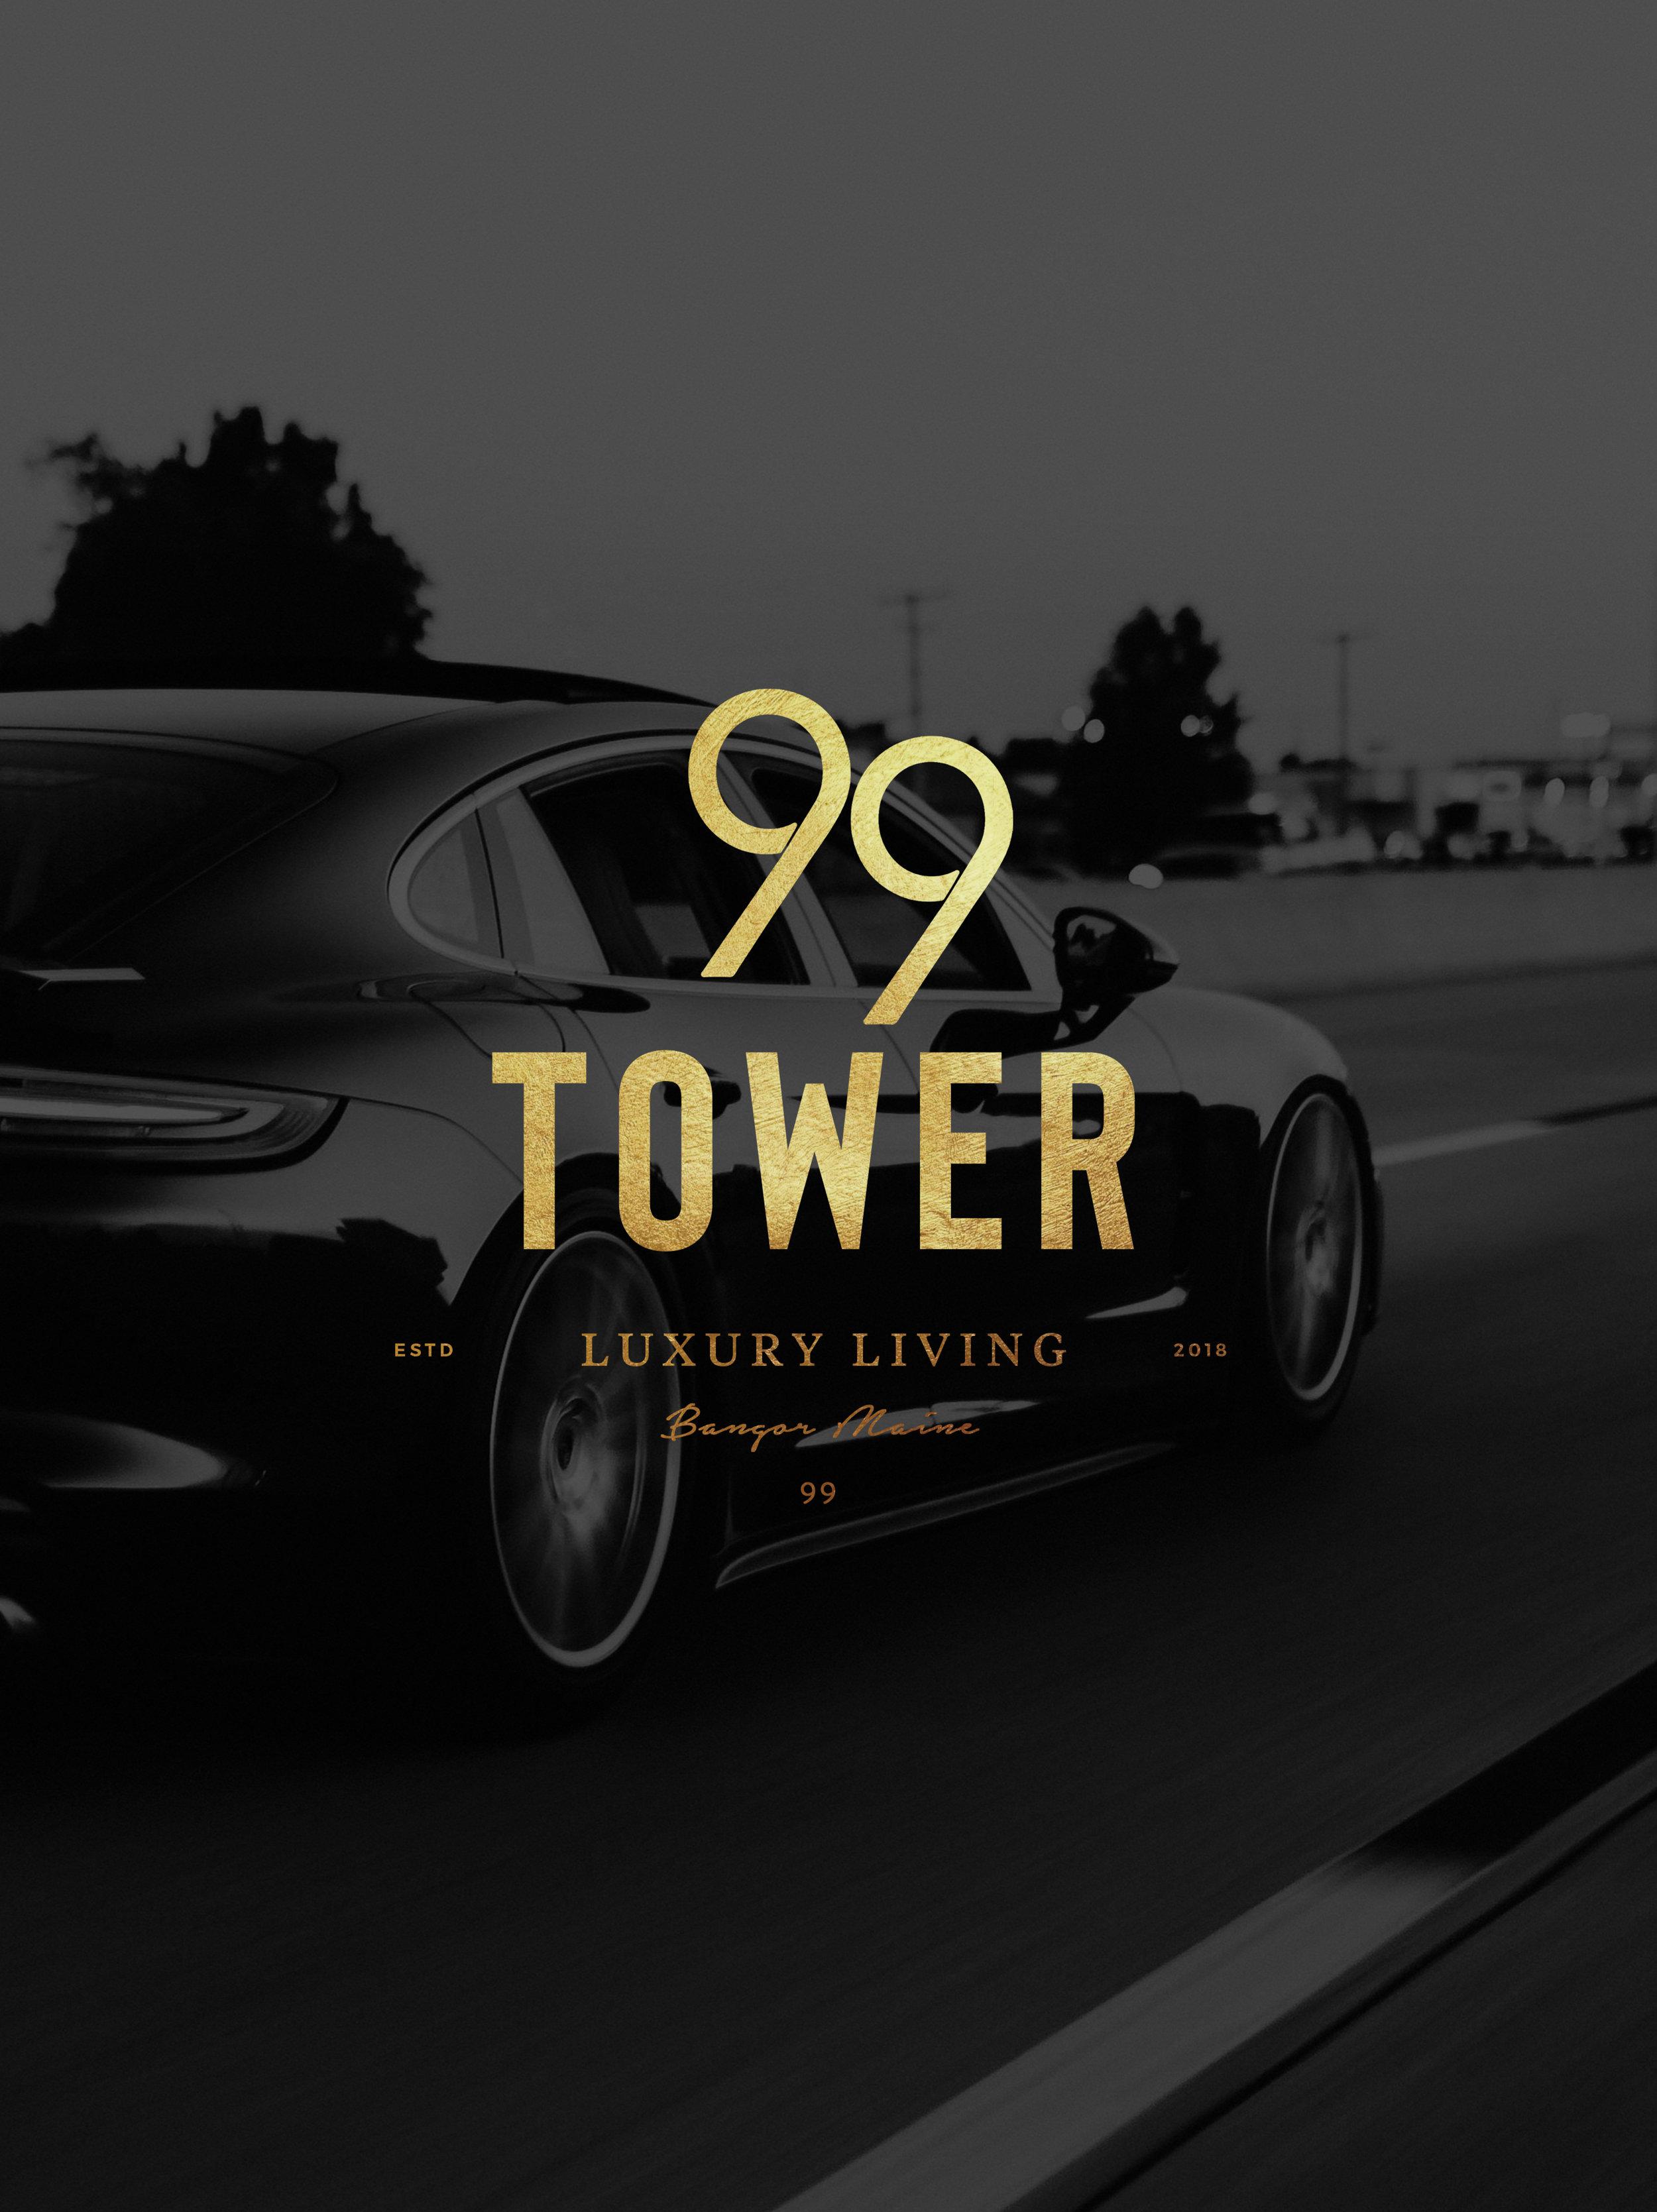 tower 99 thumbnail.jpg